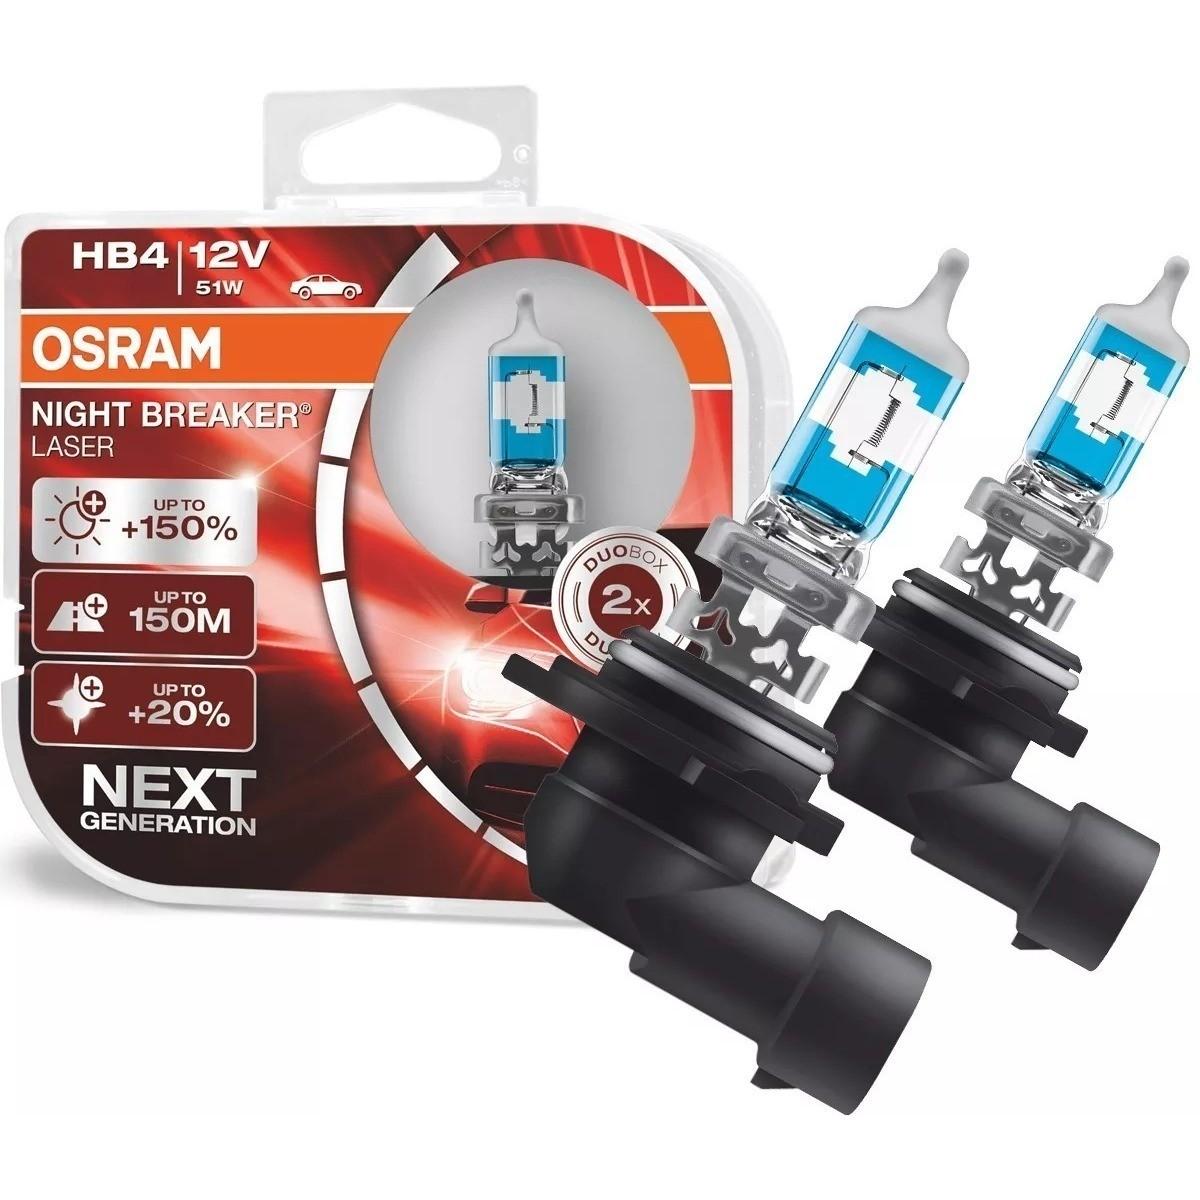 Par De Lampadas Hb4 Osram Night Breaker Laser Super Efeito Xenon 3900k 150% + luz  - Rea Comércio - Sua Loja Completa!